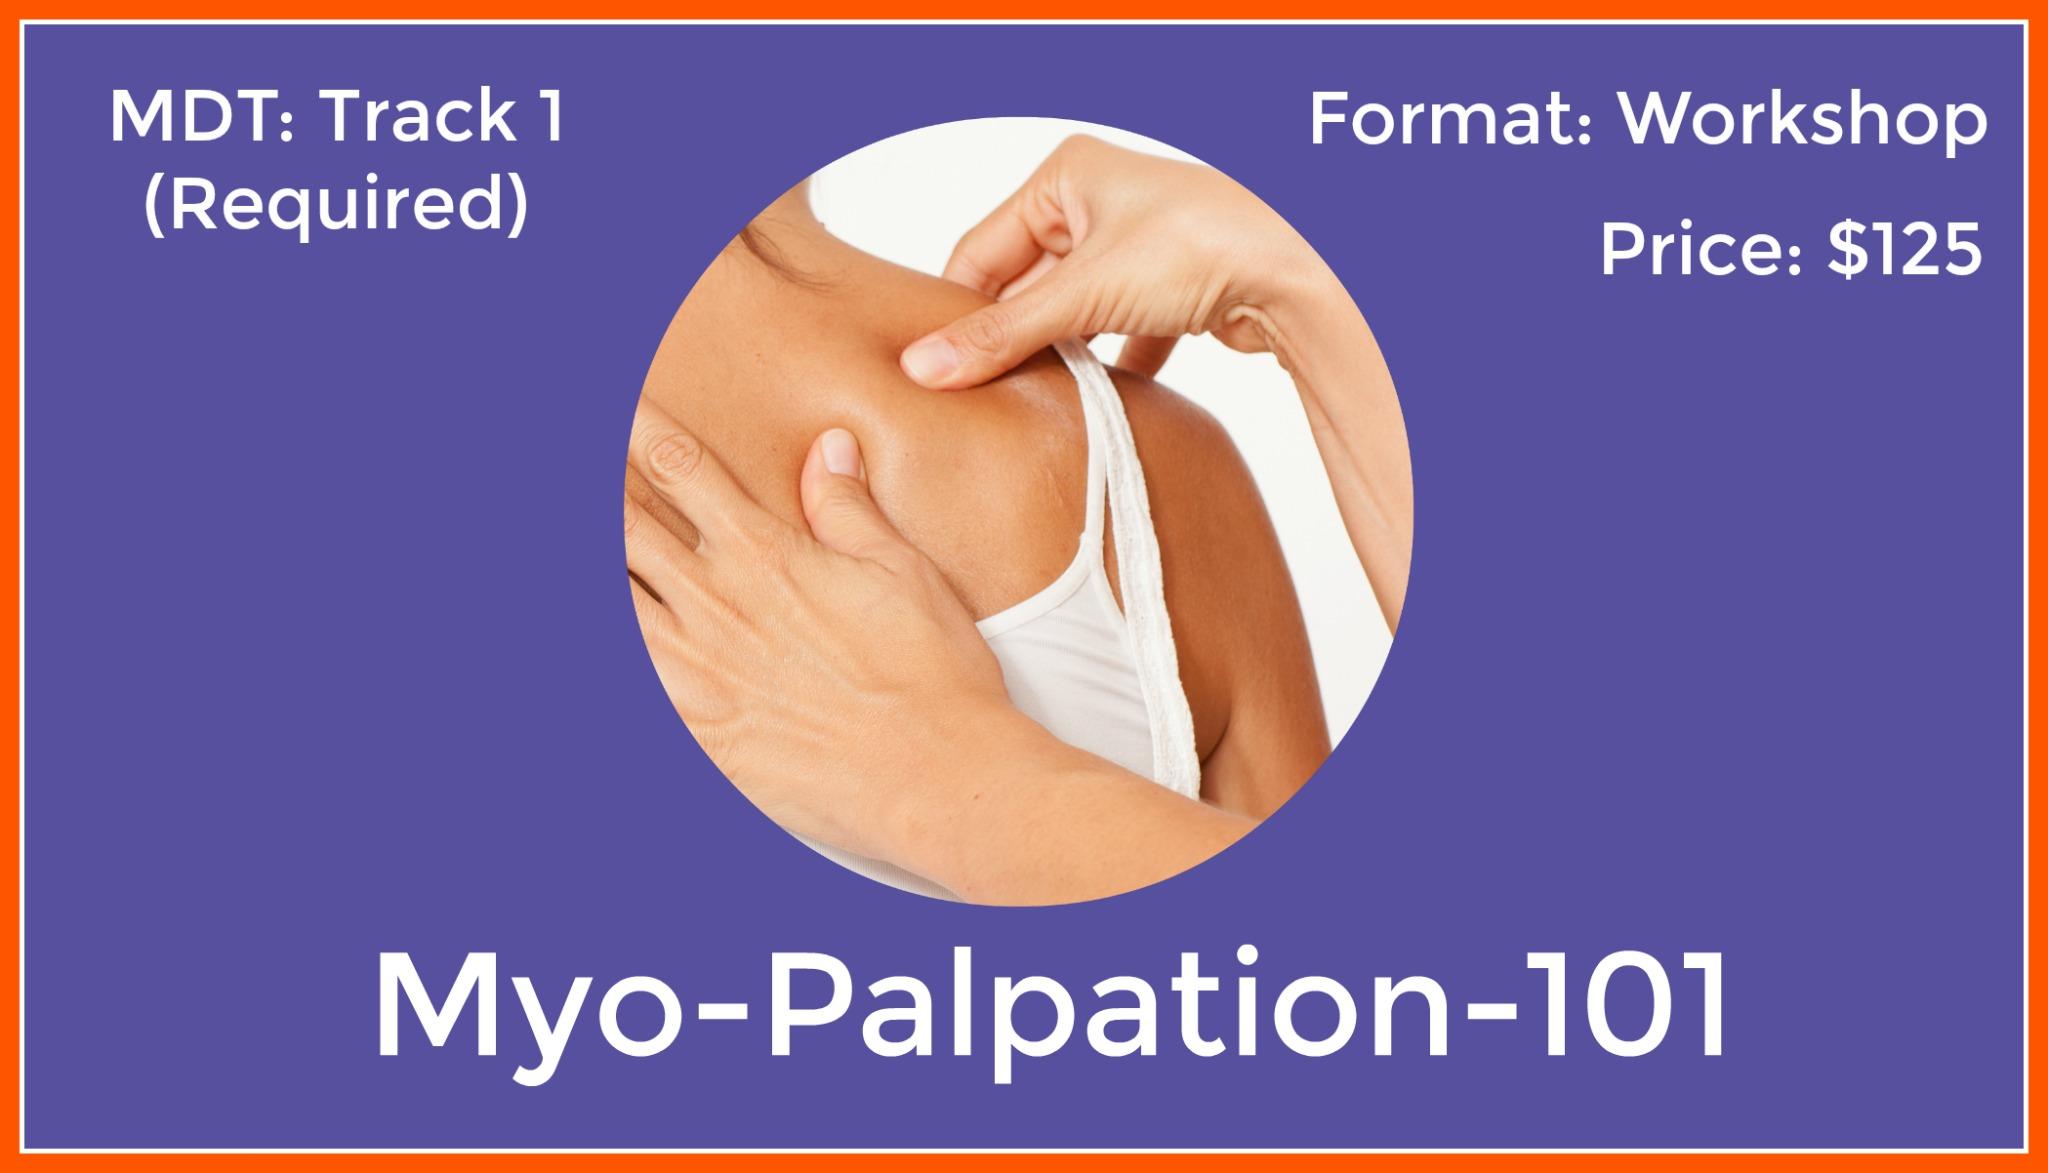 MPA-101<br>Myo-Palpation-Shoulder